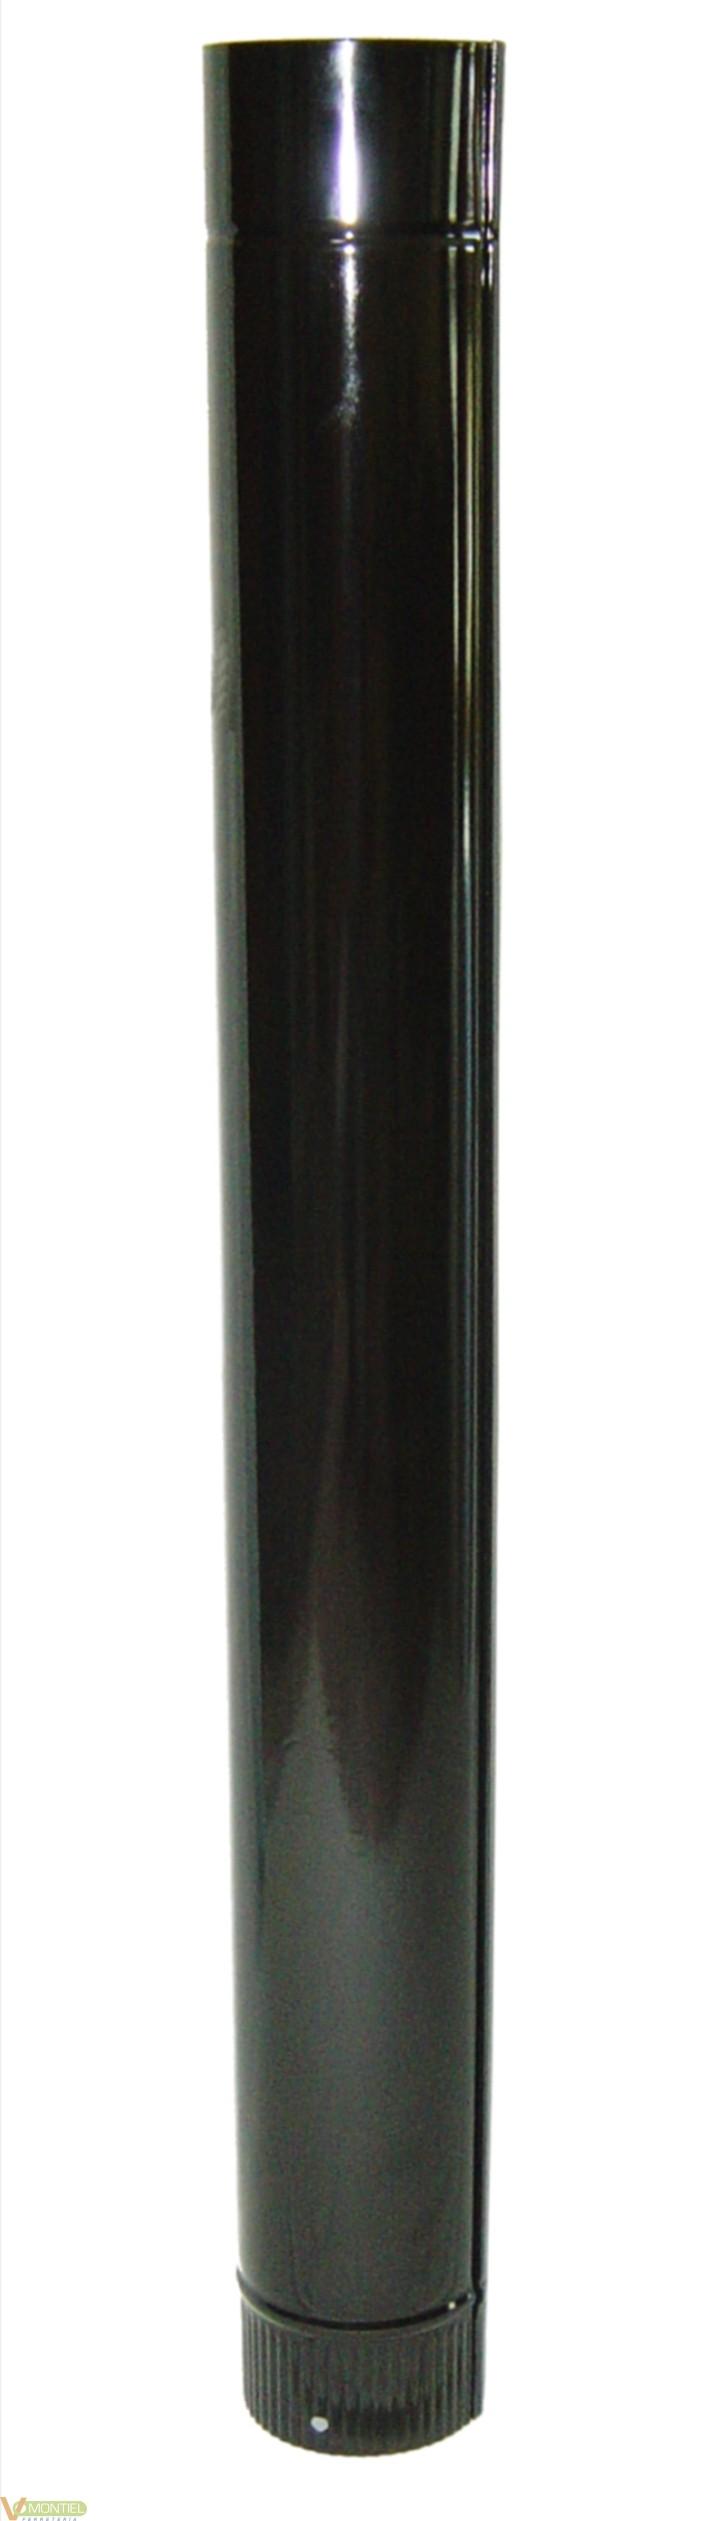 Tubo estufa 100mm a/esm-0